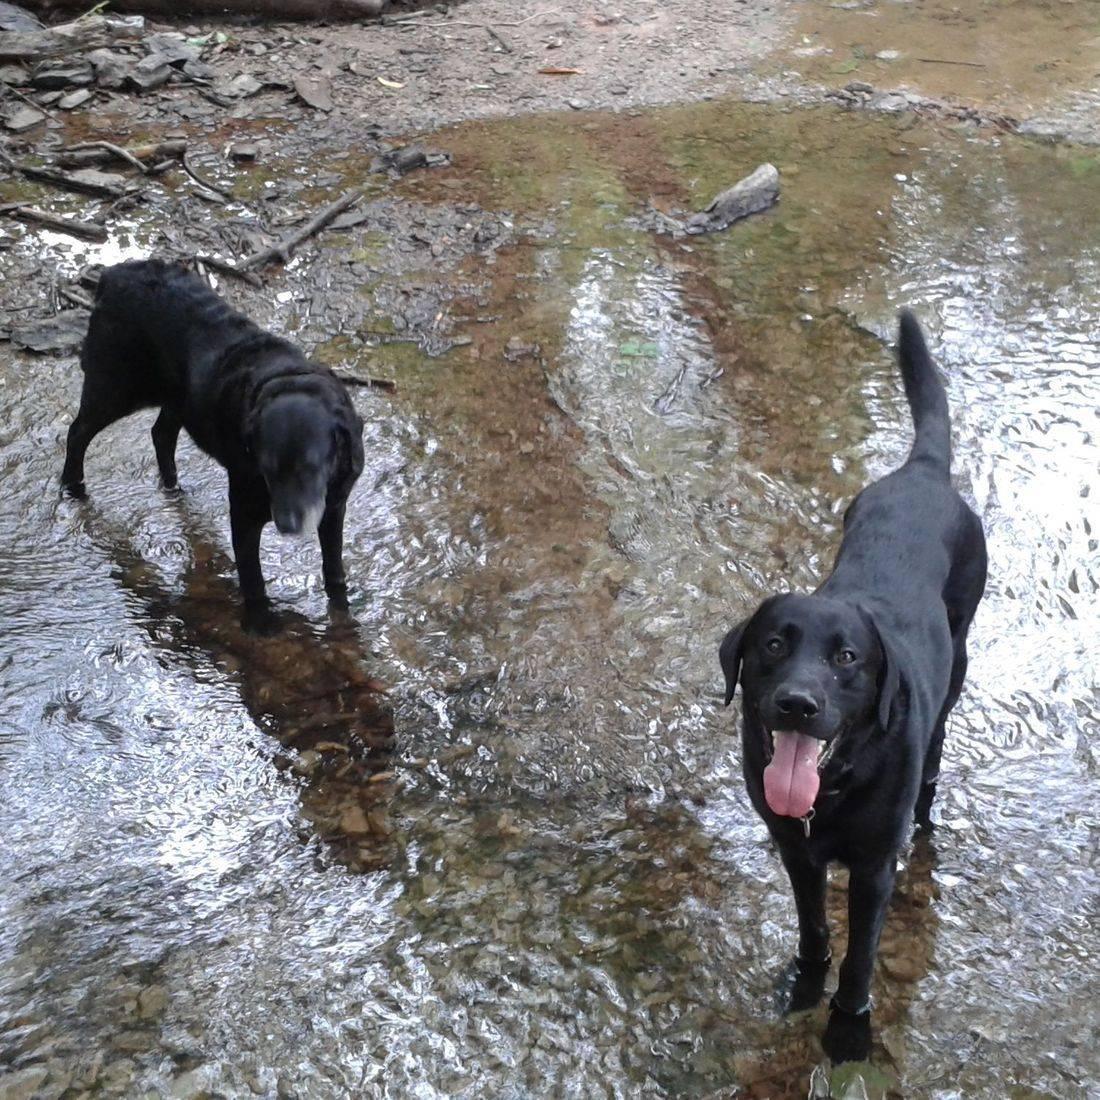 Black labradors in the stream